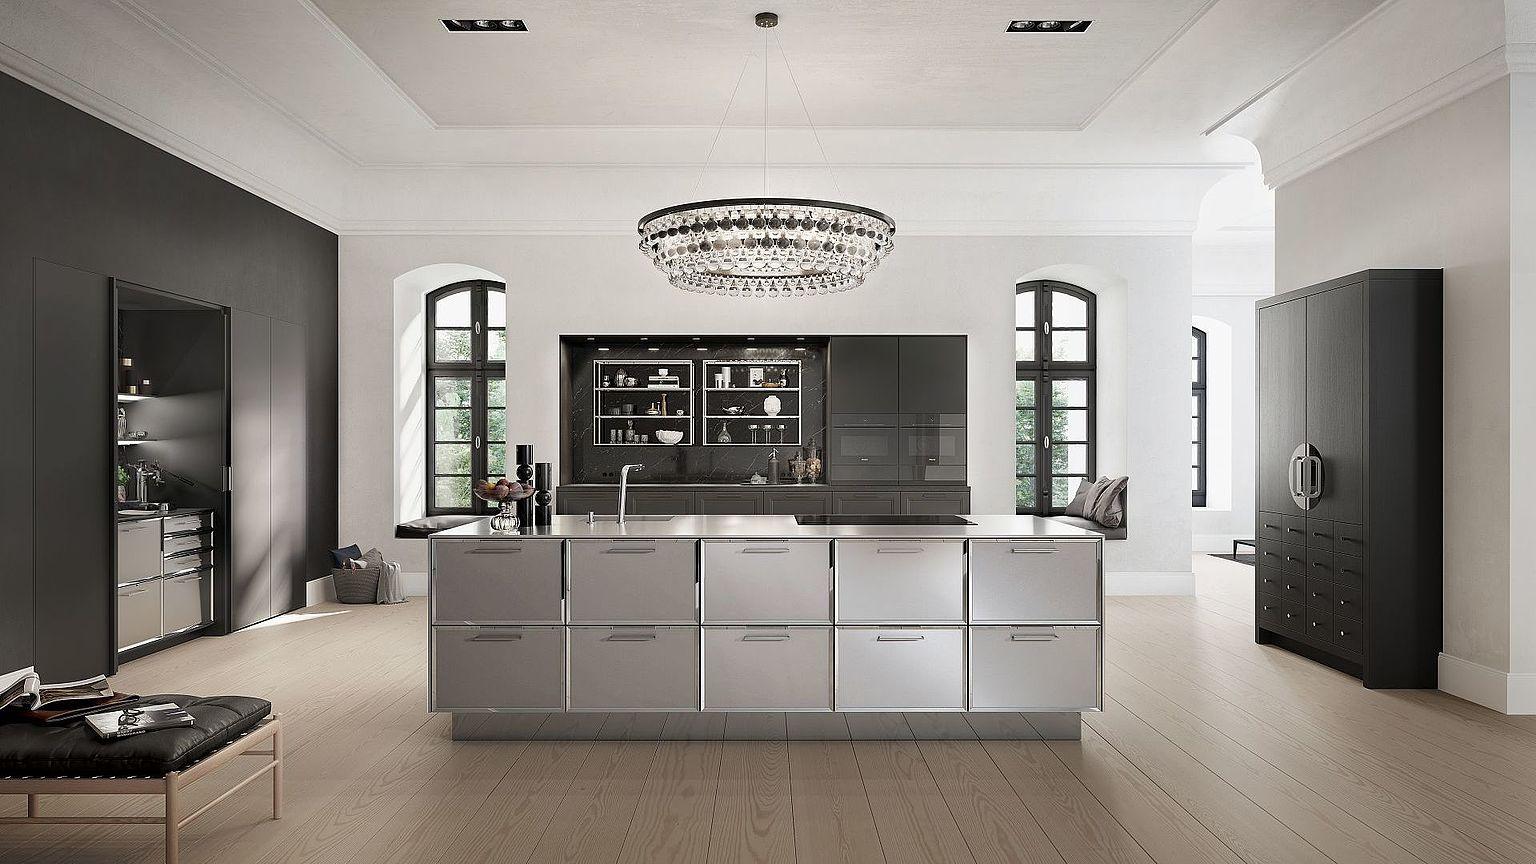 SieMatic Kitchen Interior Design of Timeless Elegance